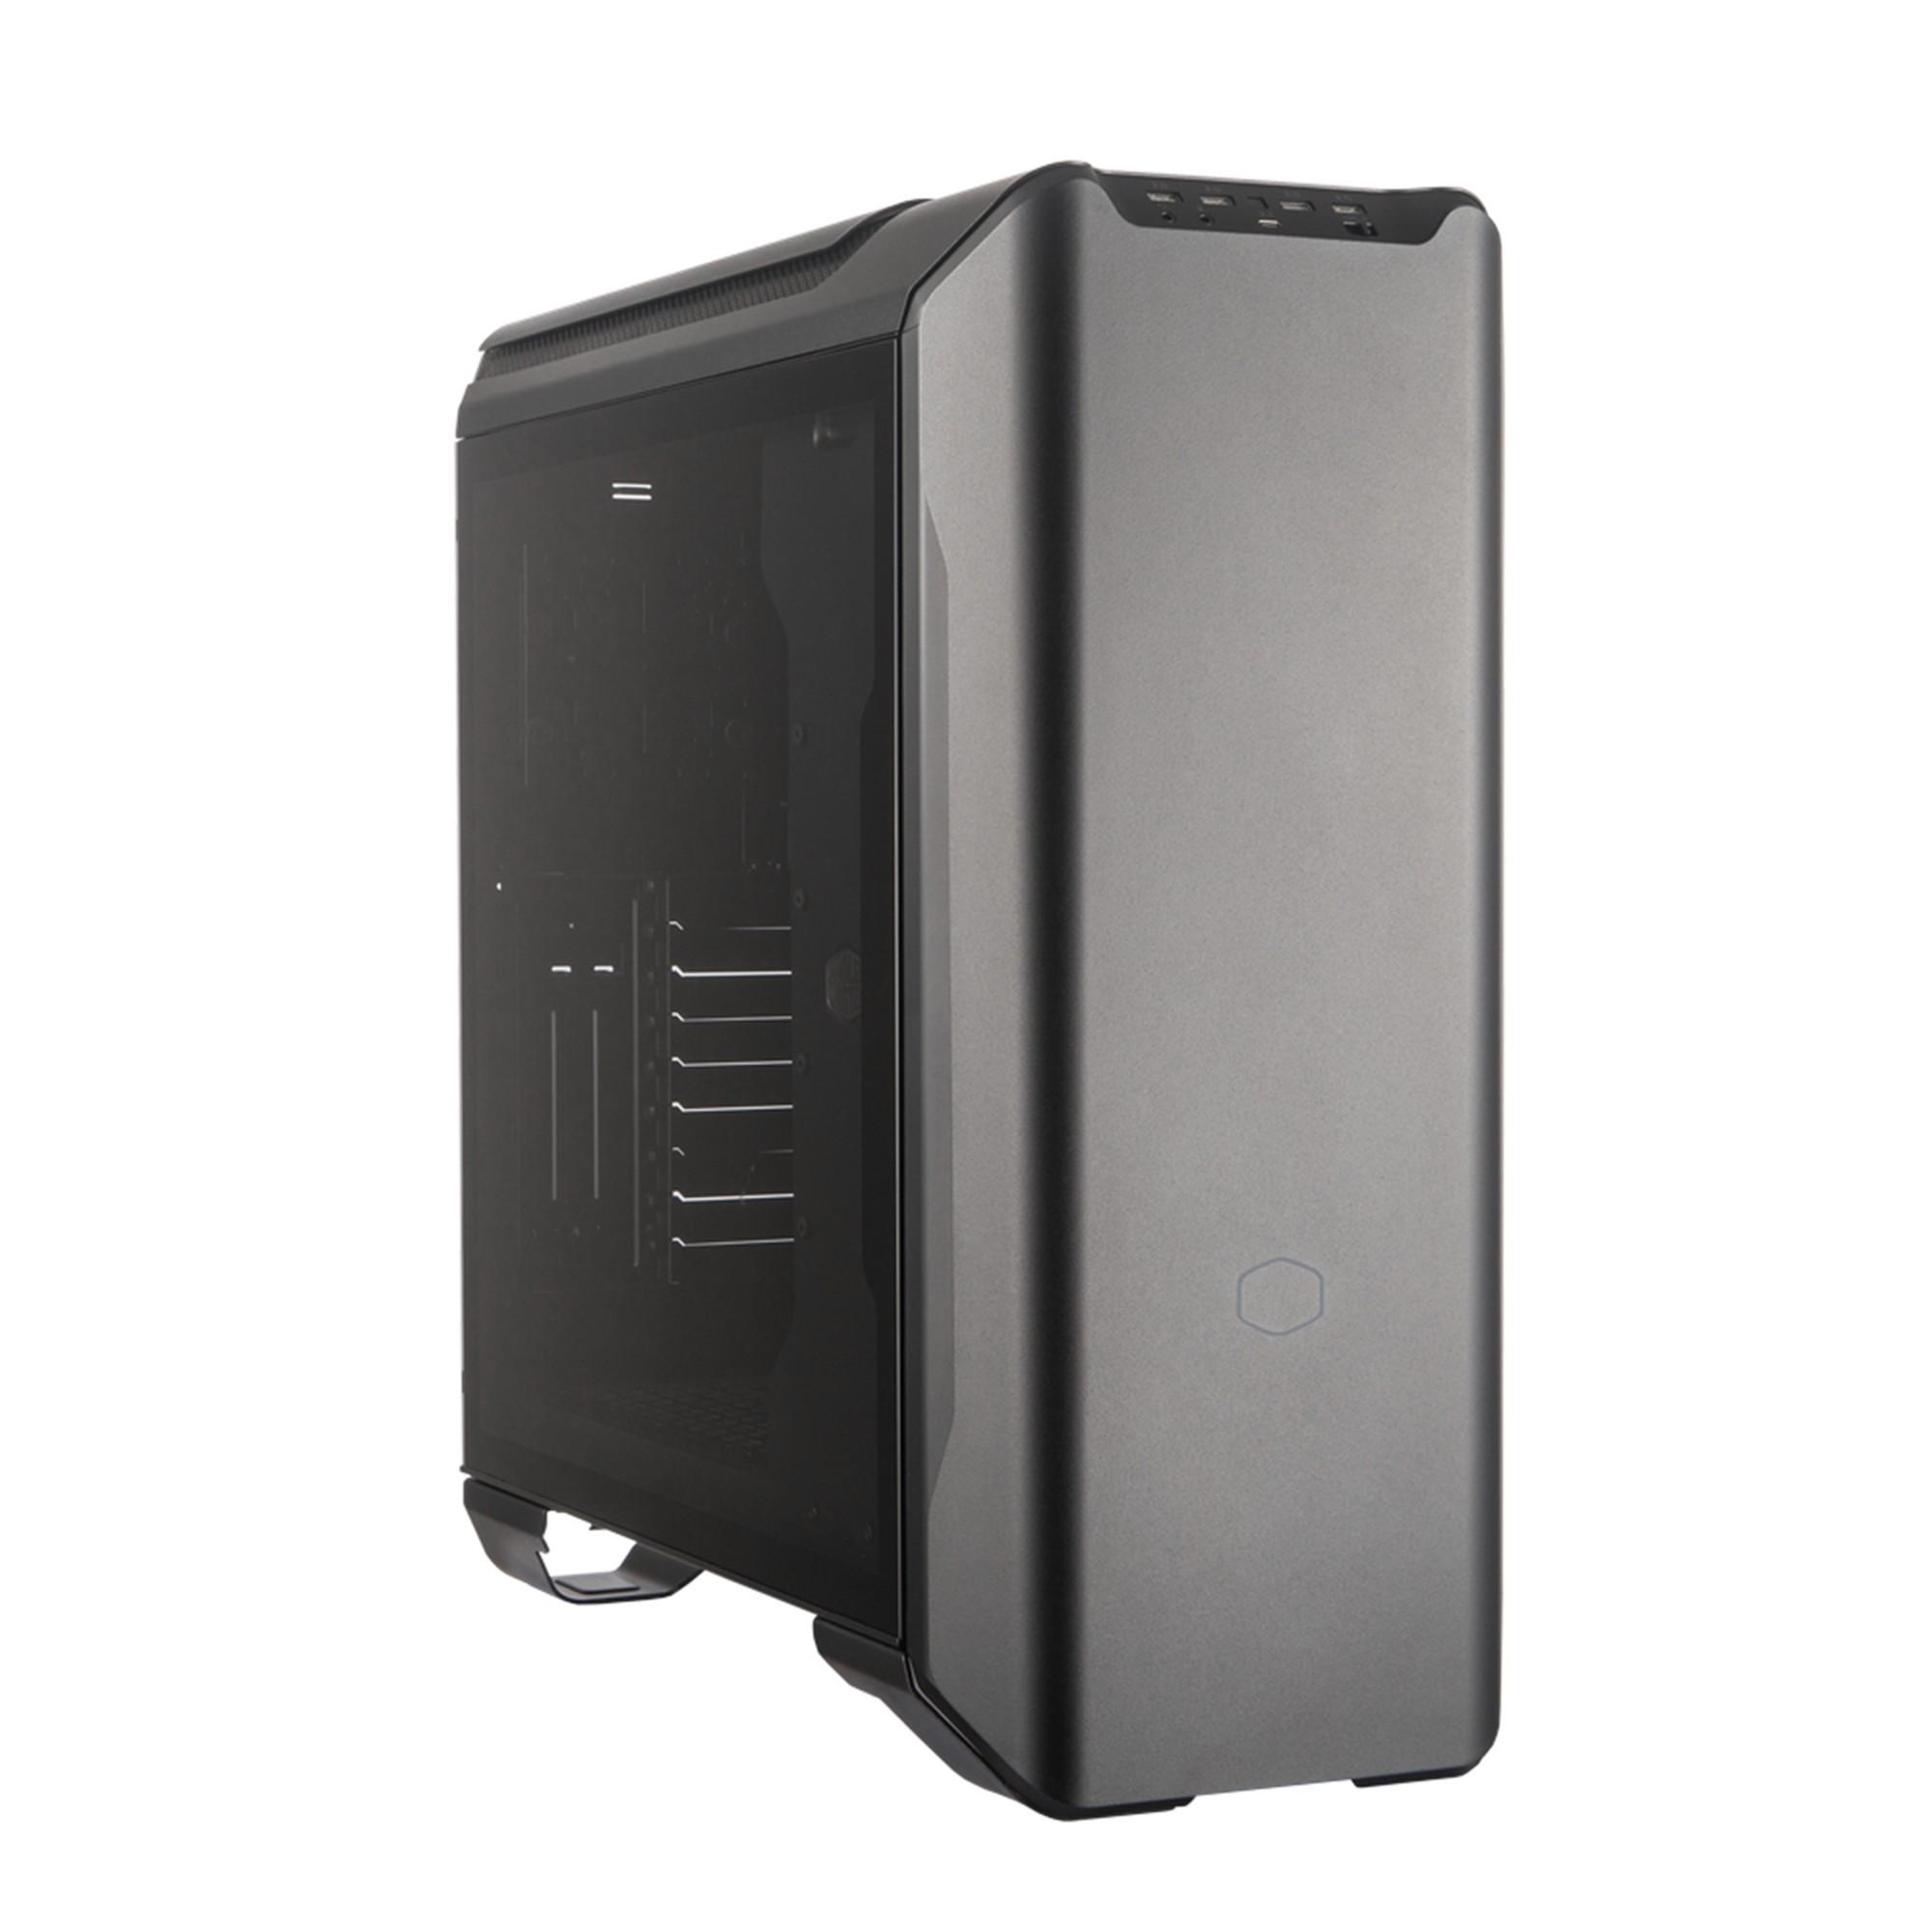 Cooler Master MasterCase SL600M Midi Tower Black